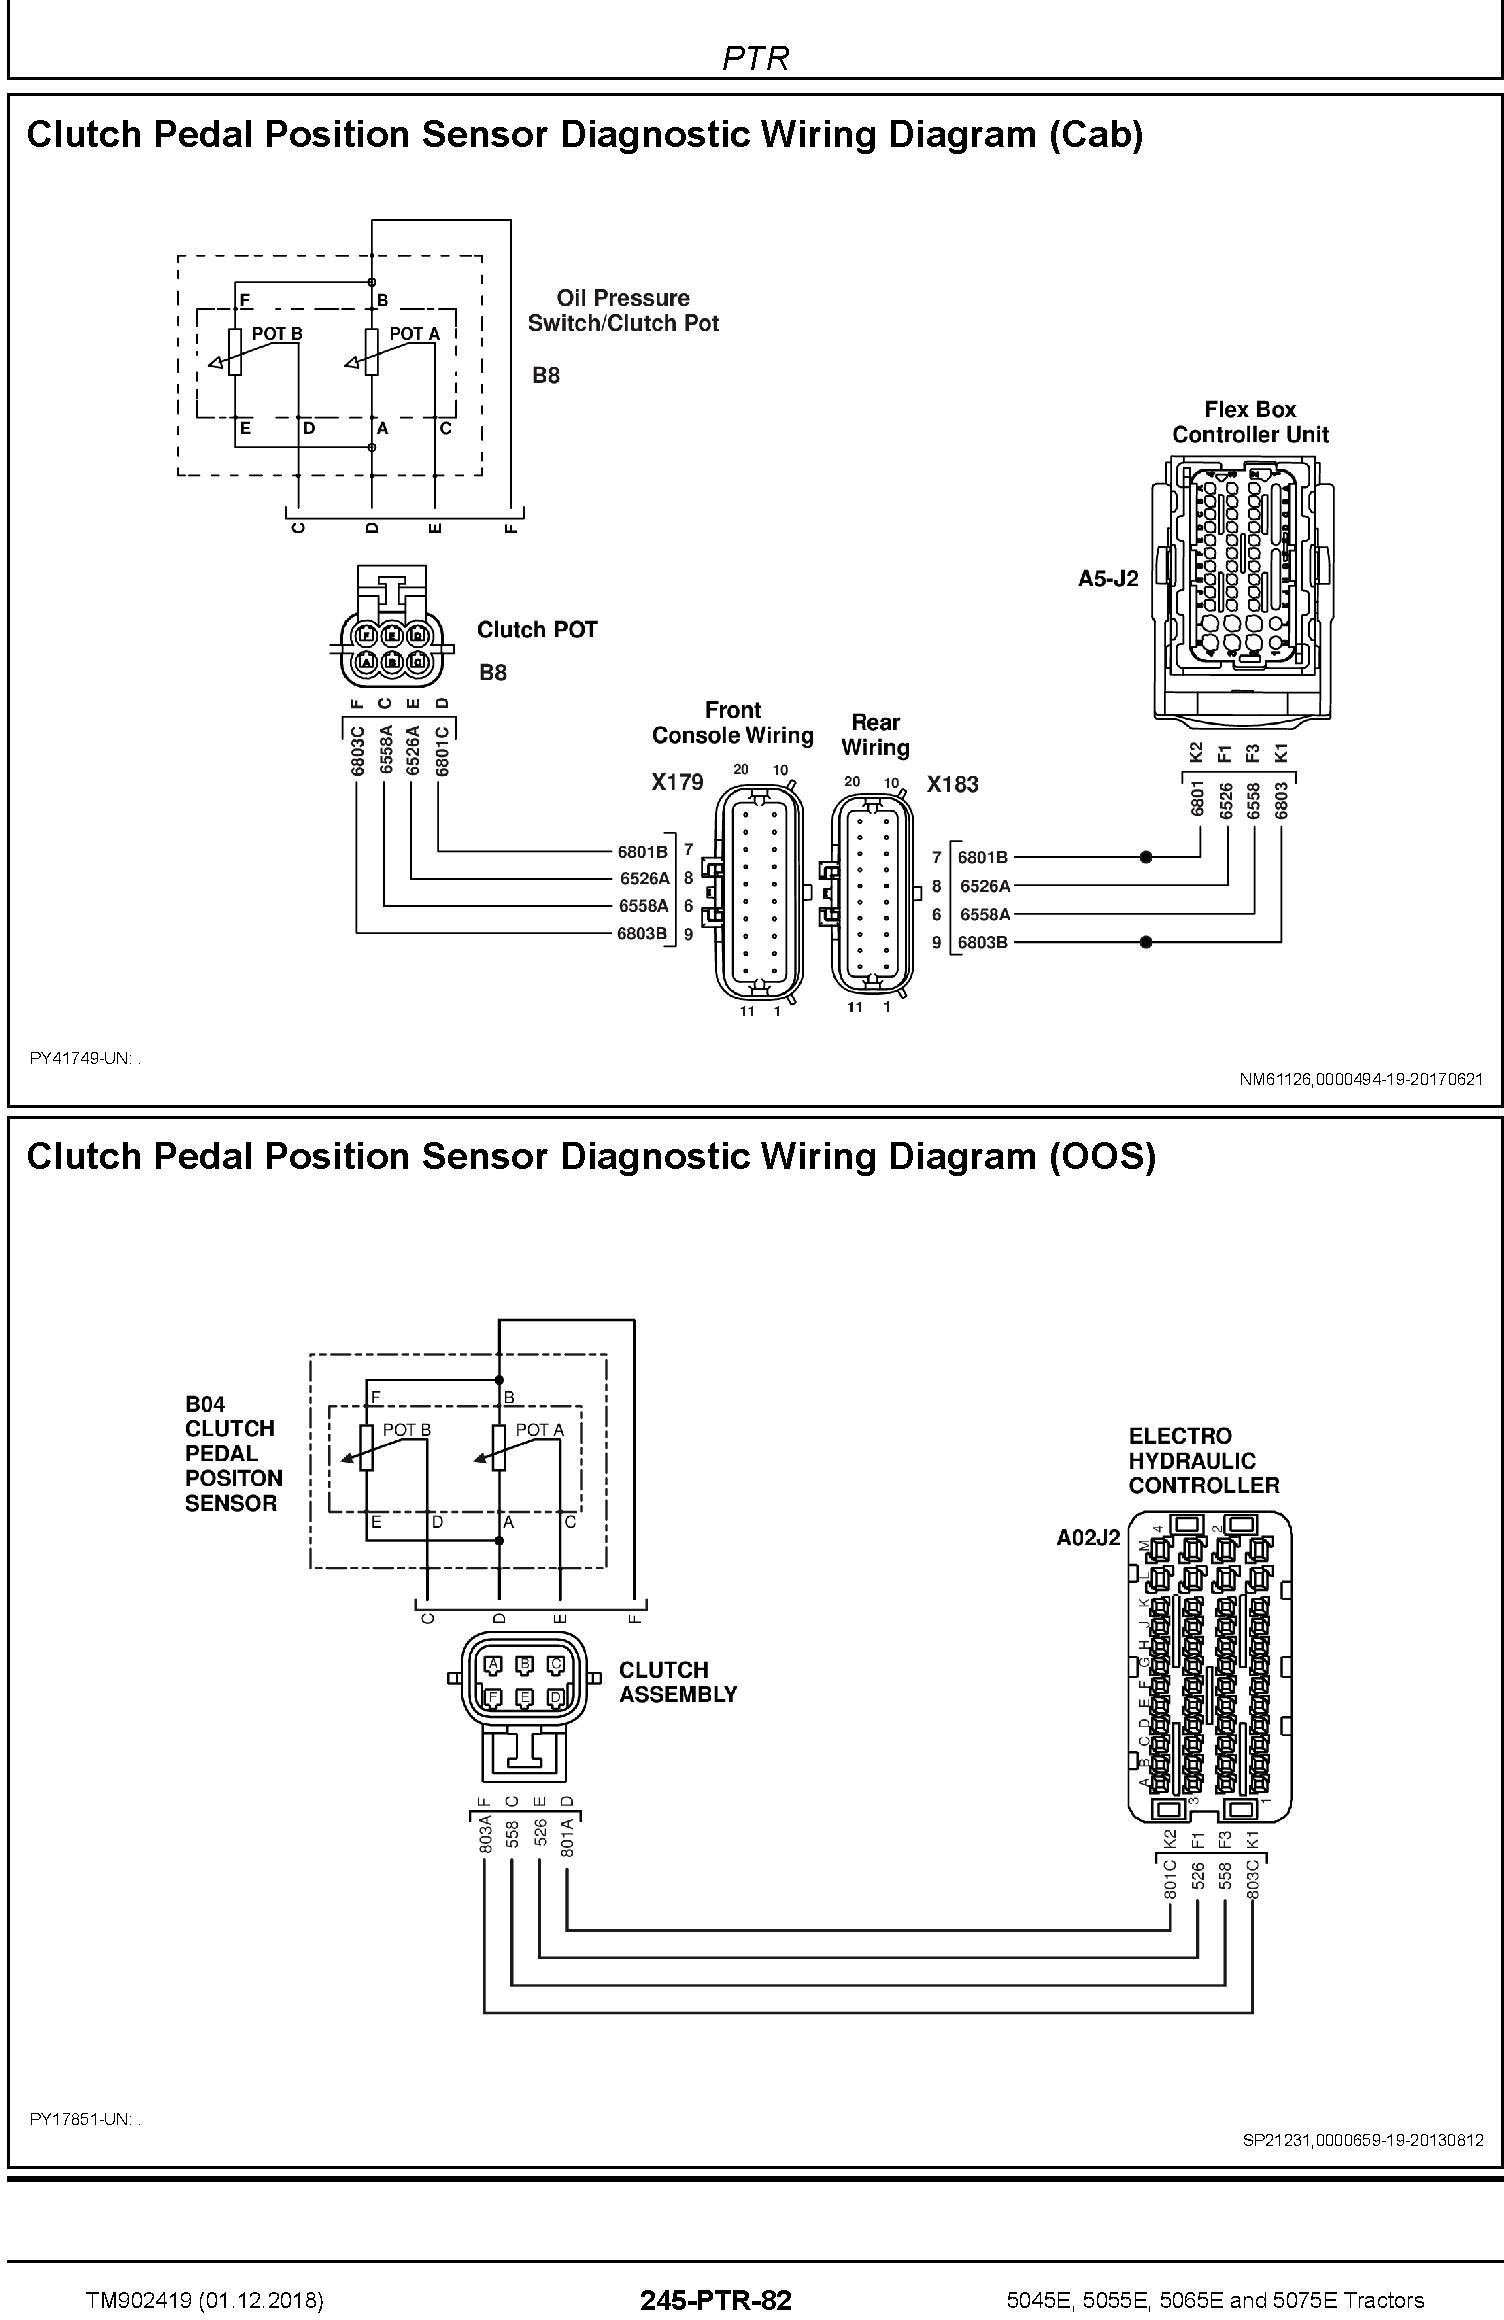 John Deere 5045E, 5055E, 5065E, 5075E USA Tractors Diagnostic Technical Service Manual (TM902419) - 2